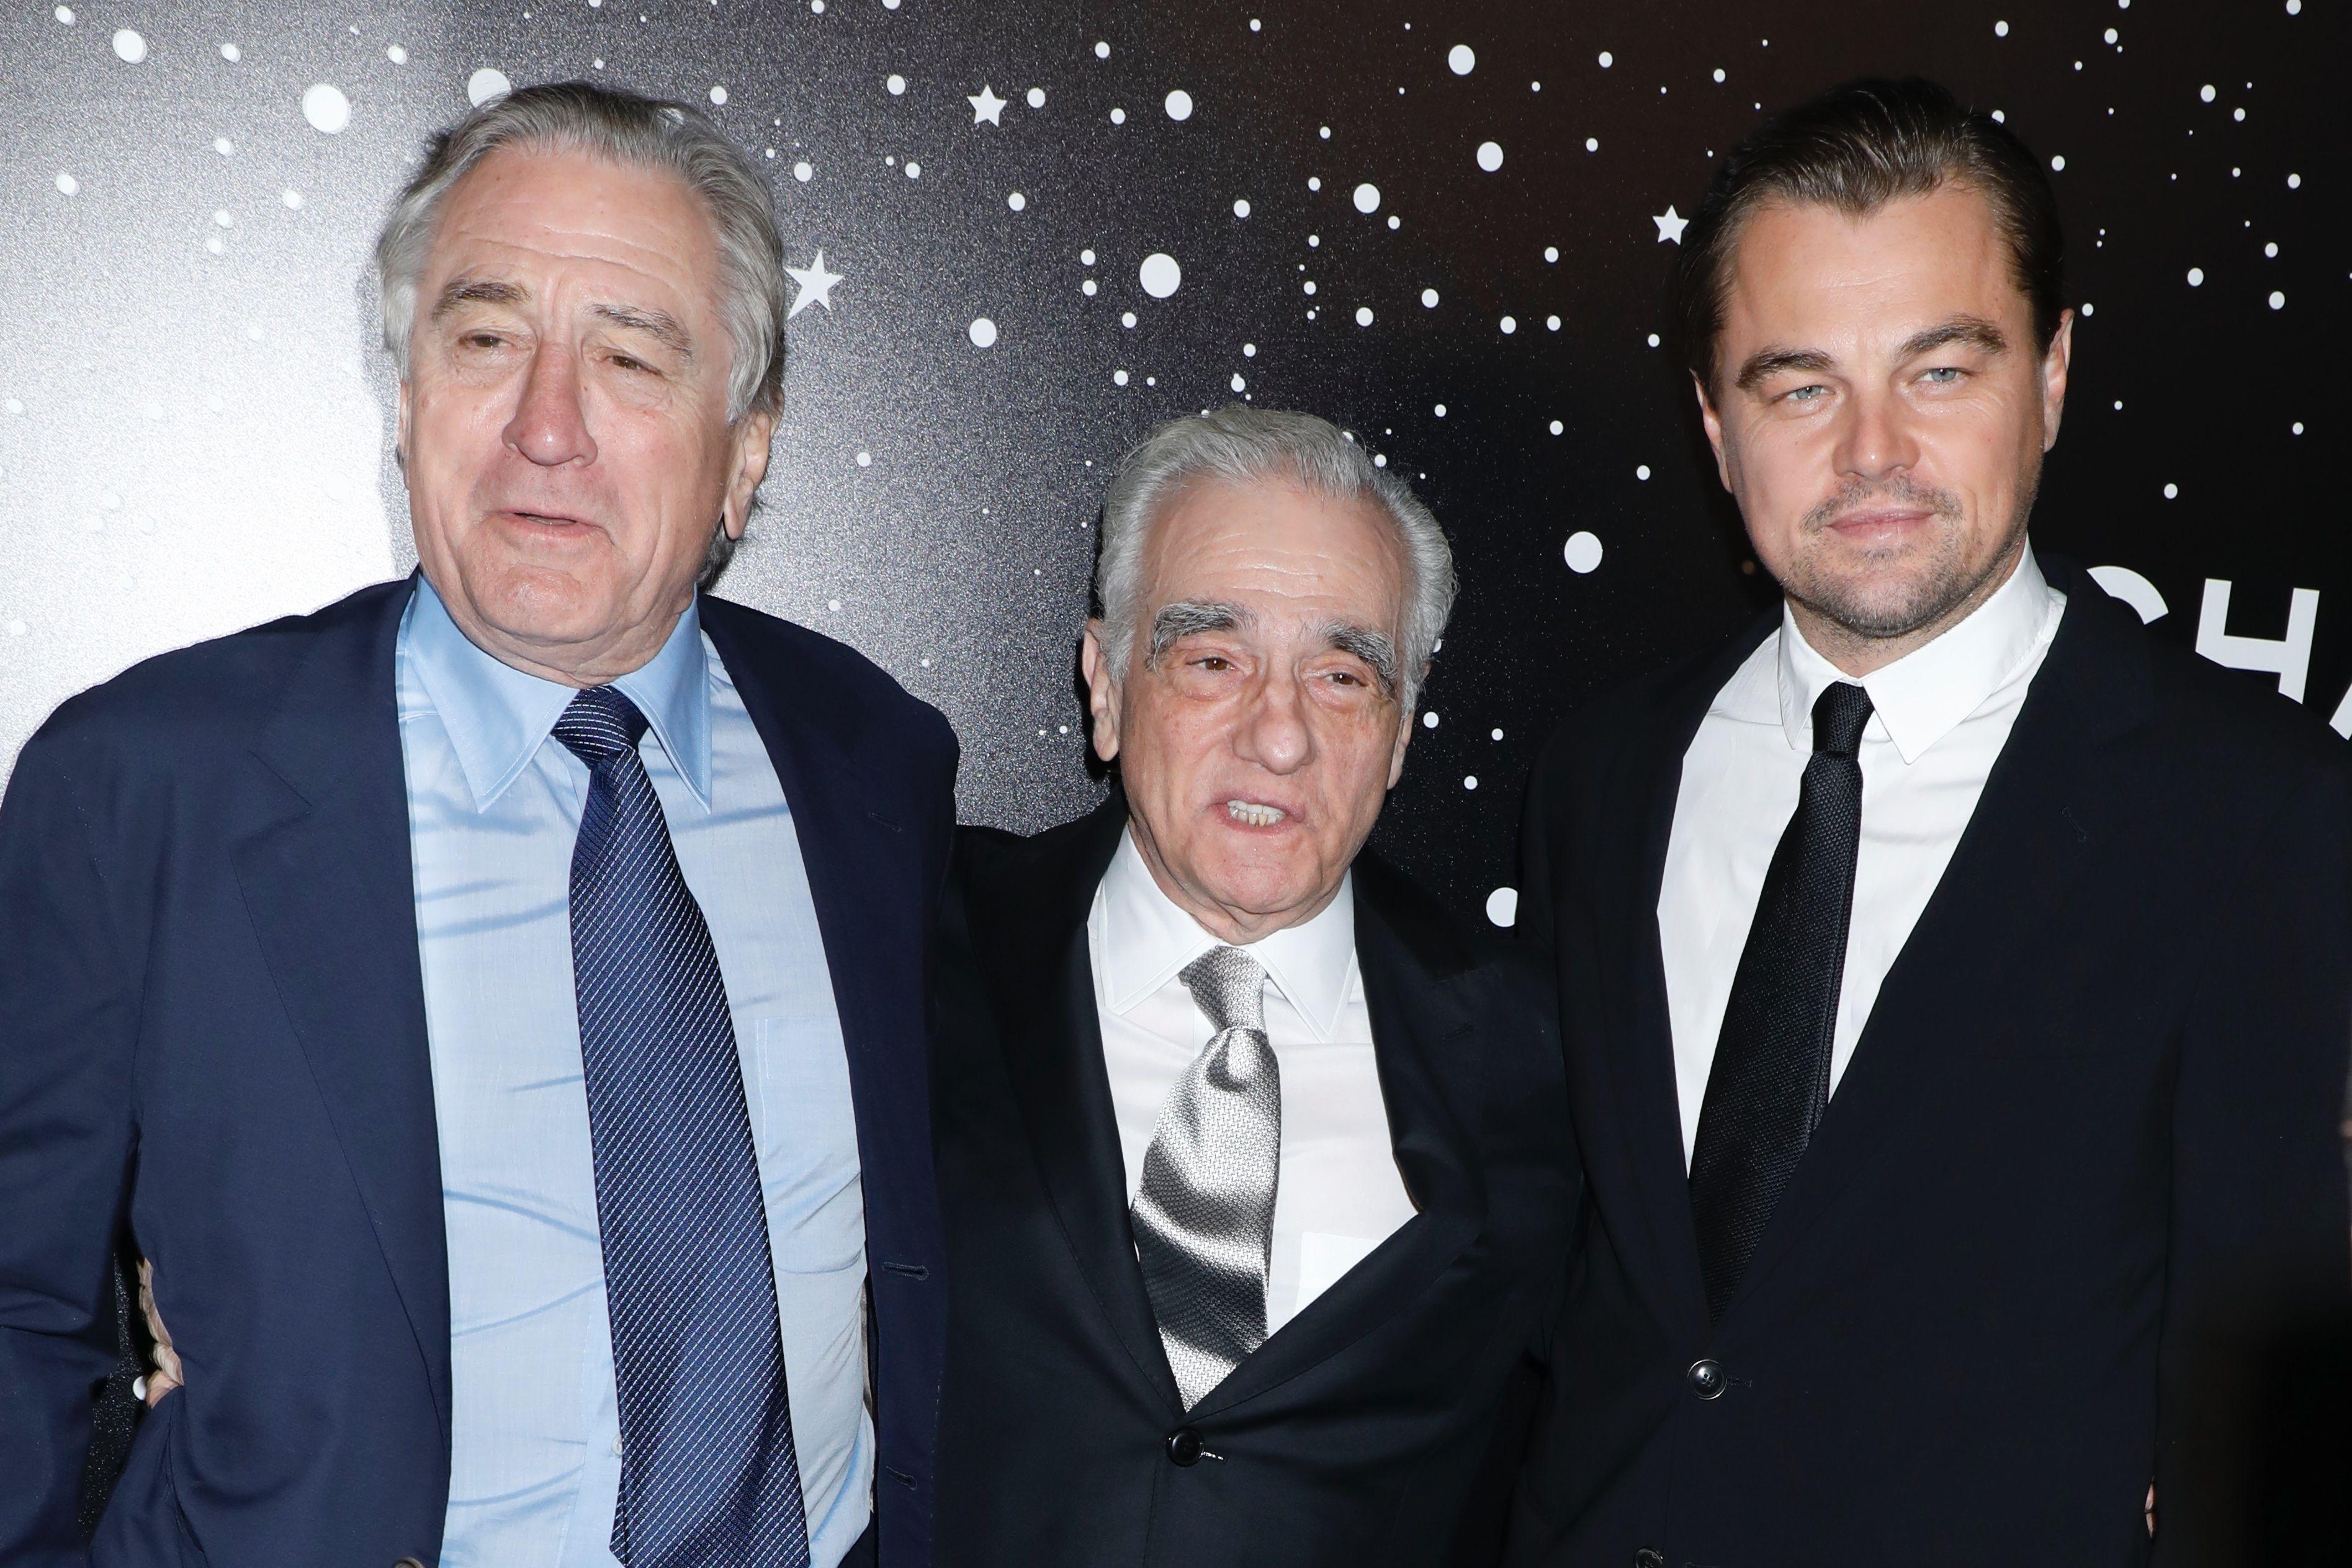 Killers of the Flower Moon: la cinta de Martin Scorsese protagonizada por  Leonardo Di Caprio y Robert De Niro - La Tercera